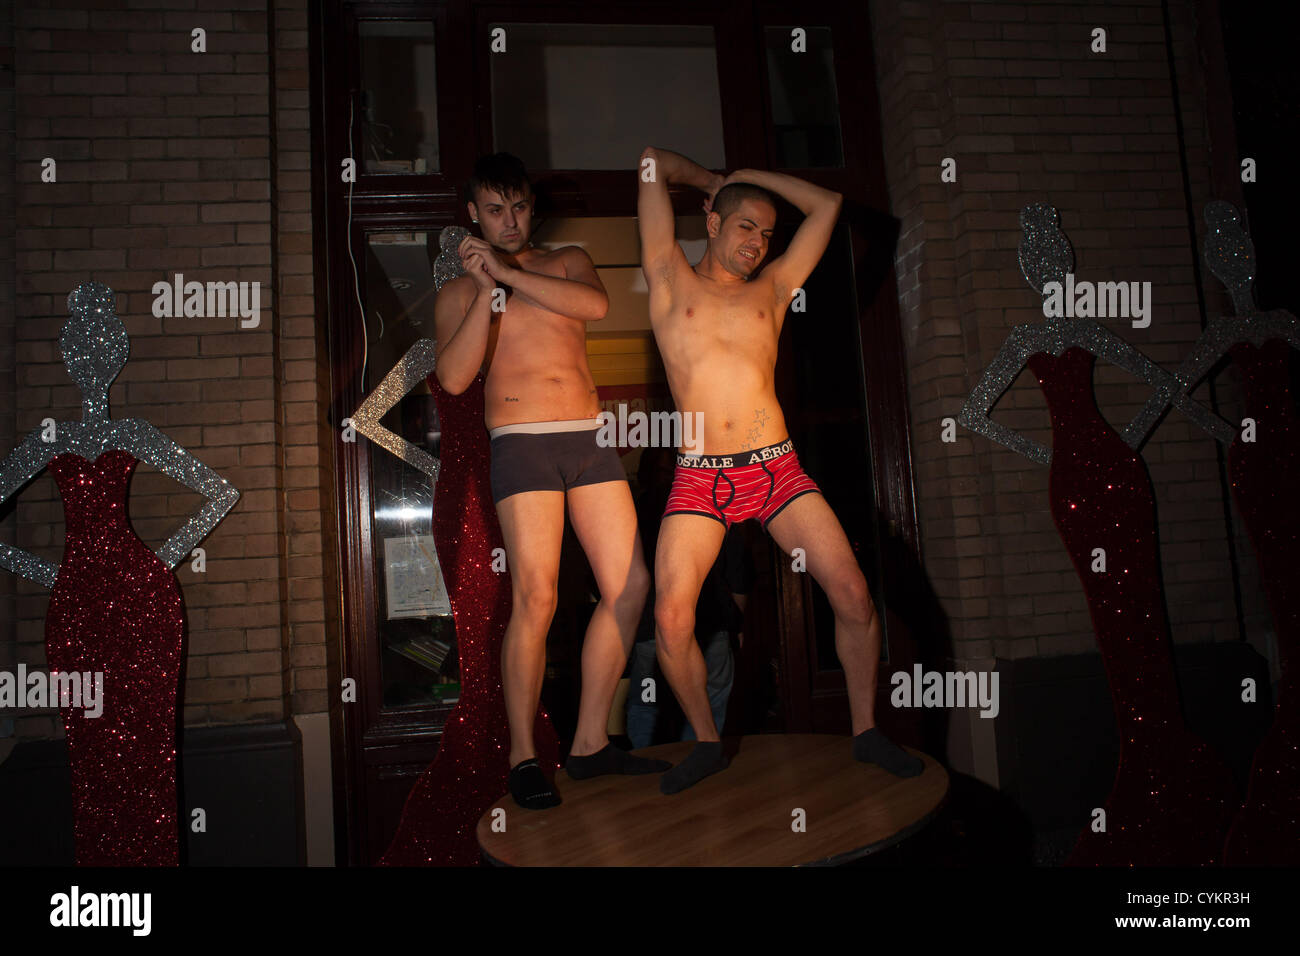 Big gay cumshot videos